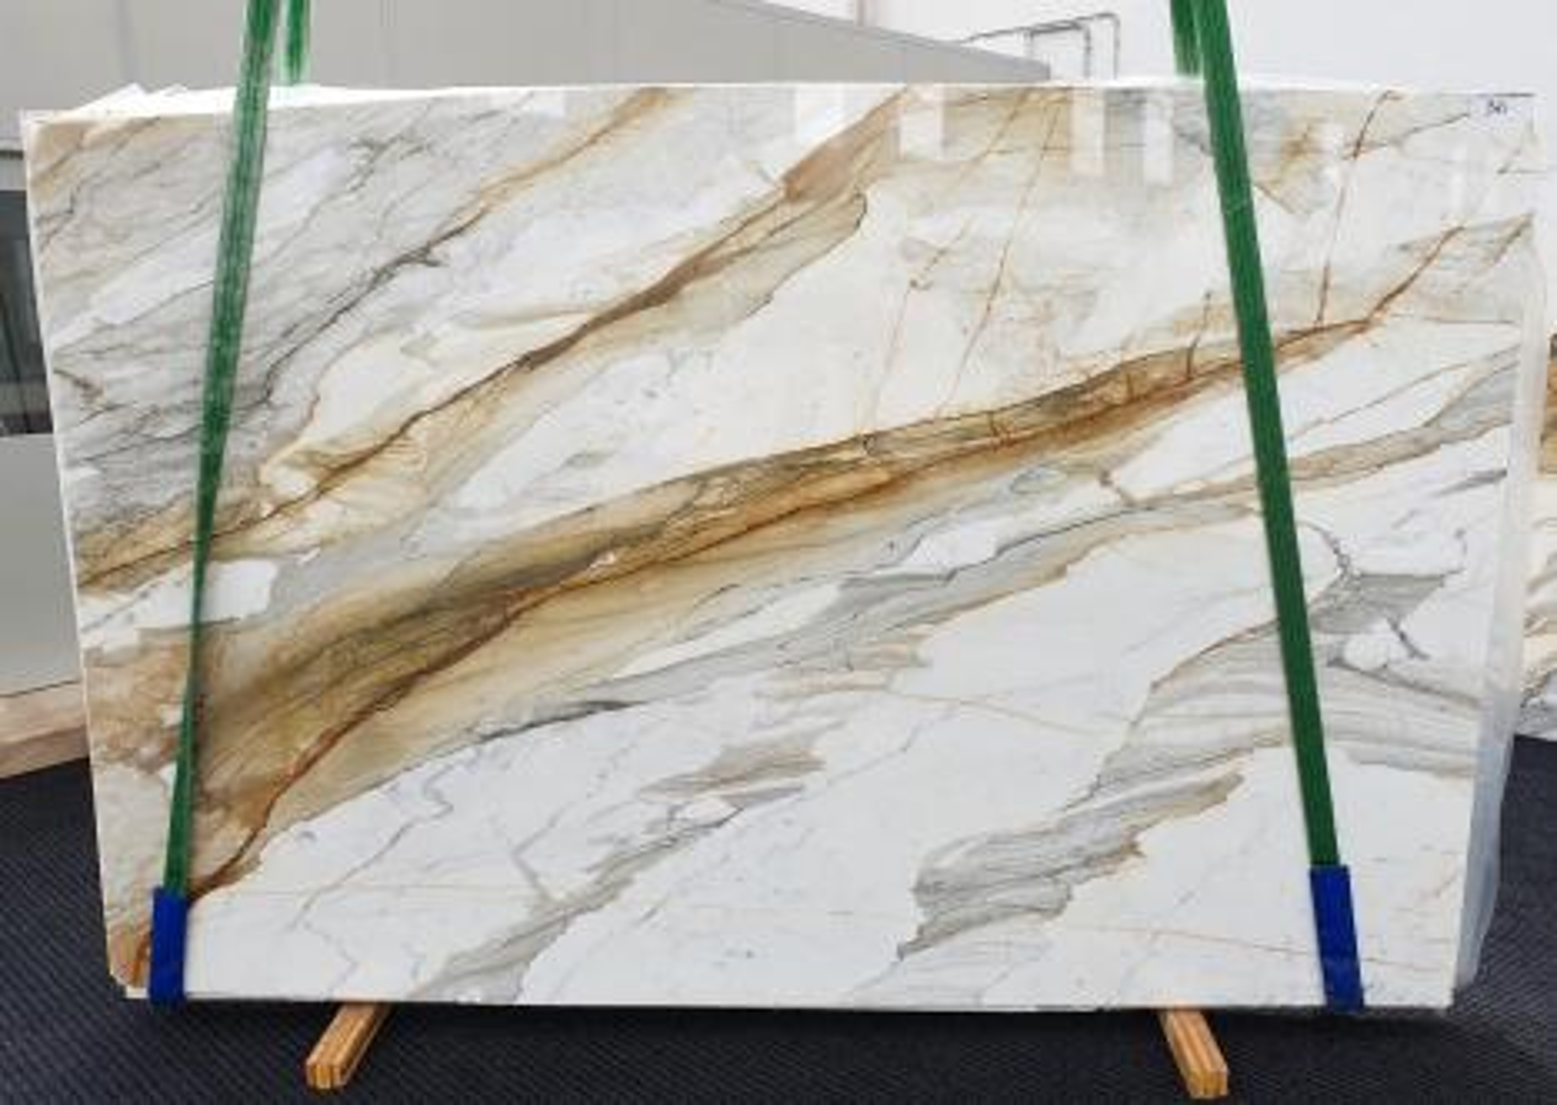 CALACATTA MACCHIAVECCHIA Suministro Veneto (Italia) de planchas pulidas en mármol natural 1354 , Slab #36